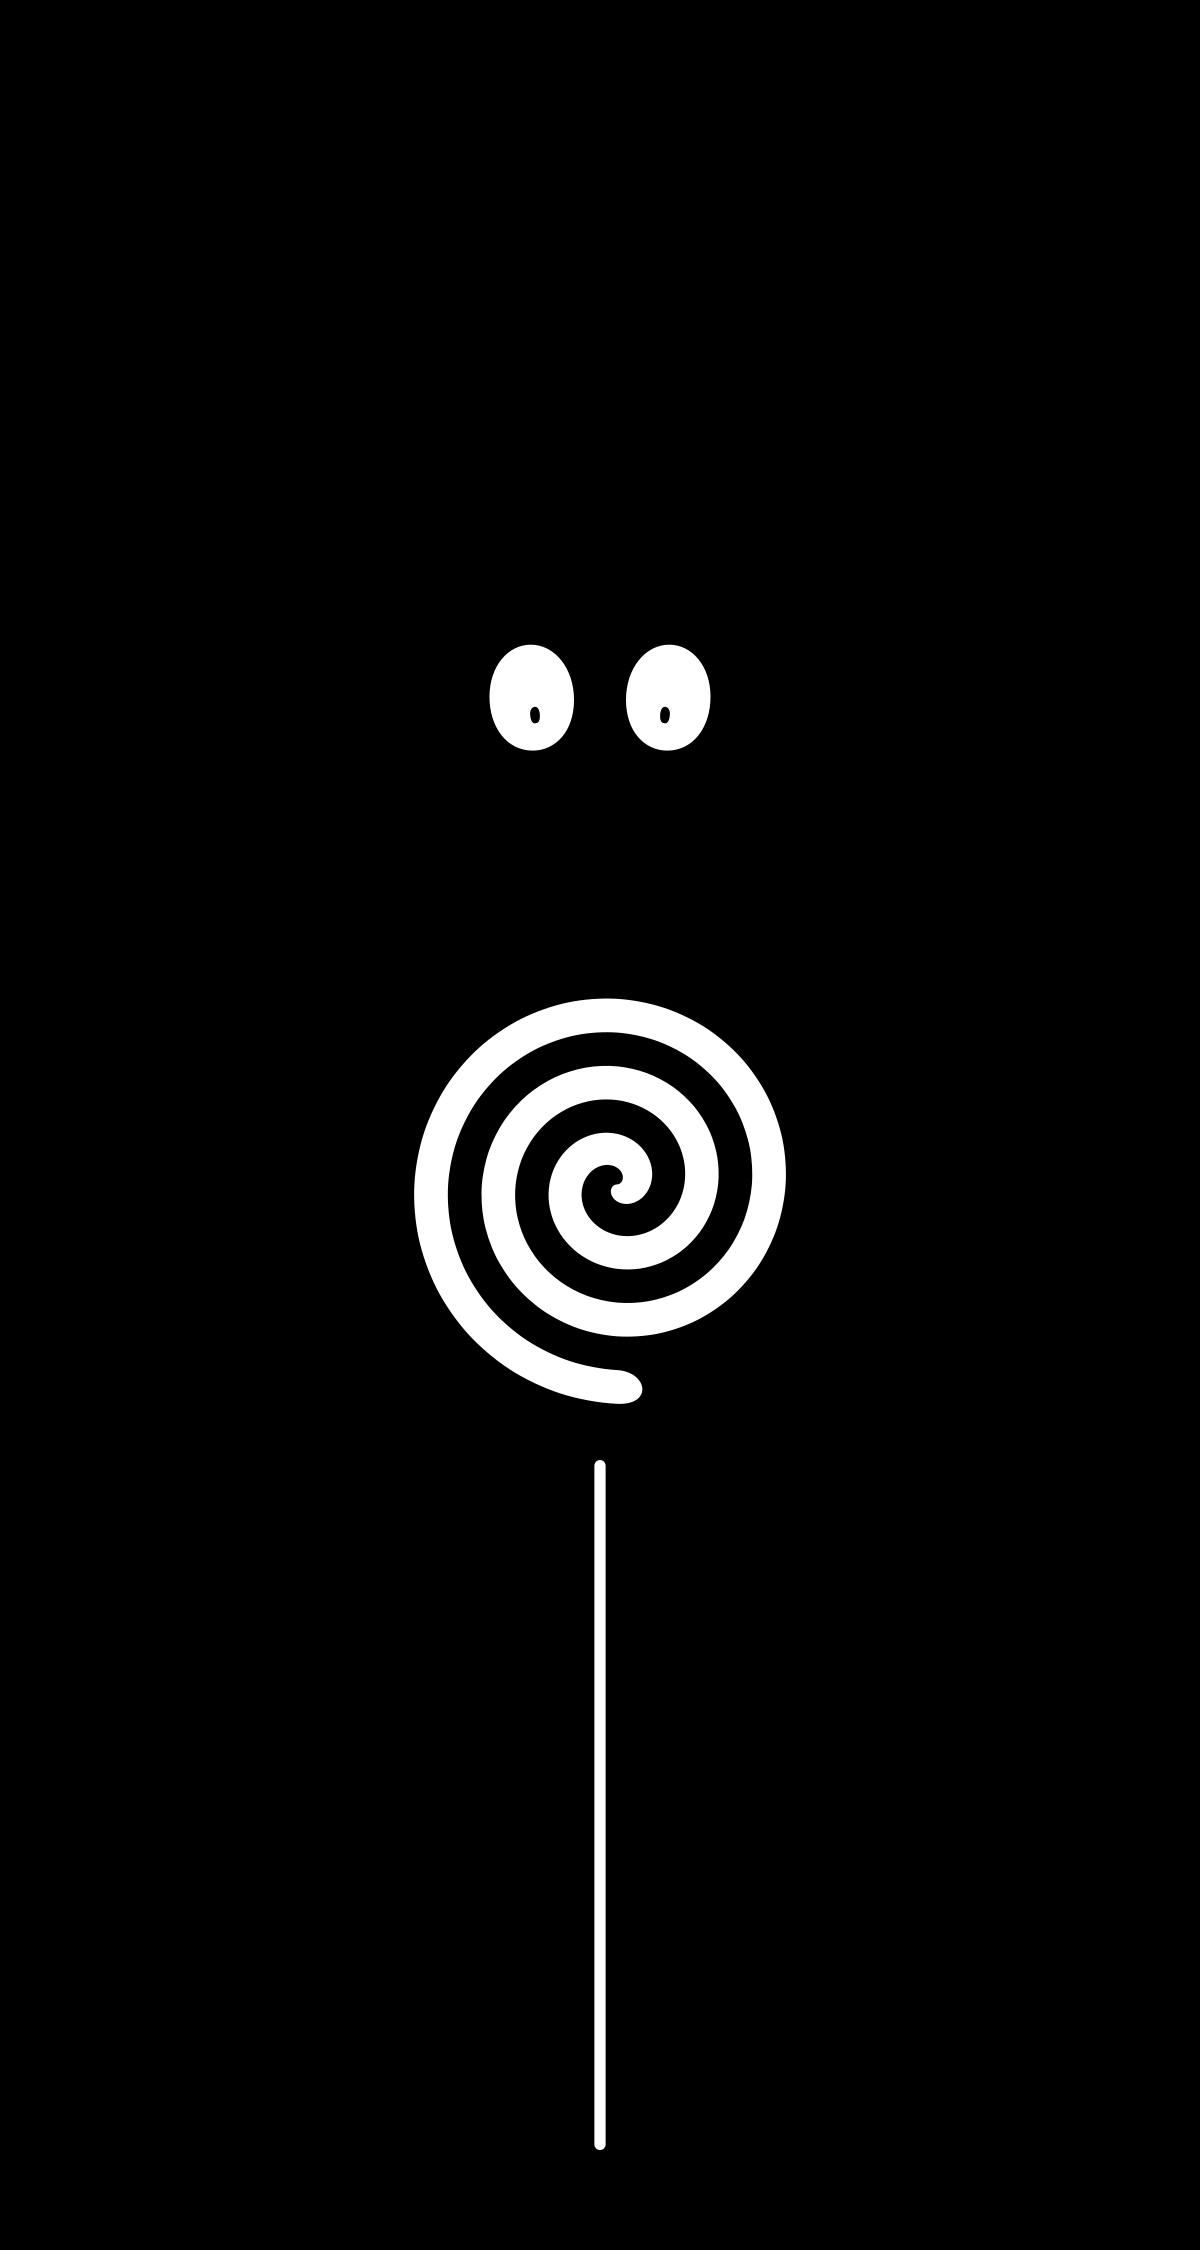 Spiral Goddess A Common Symbol Of The Modern Goddess Movement